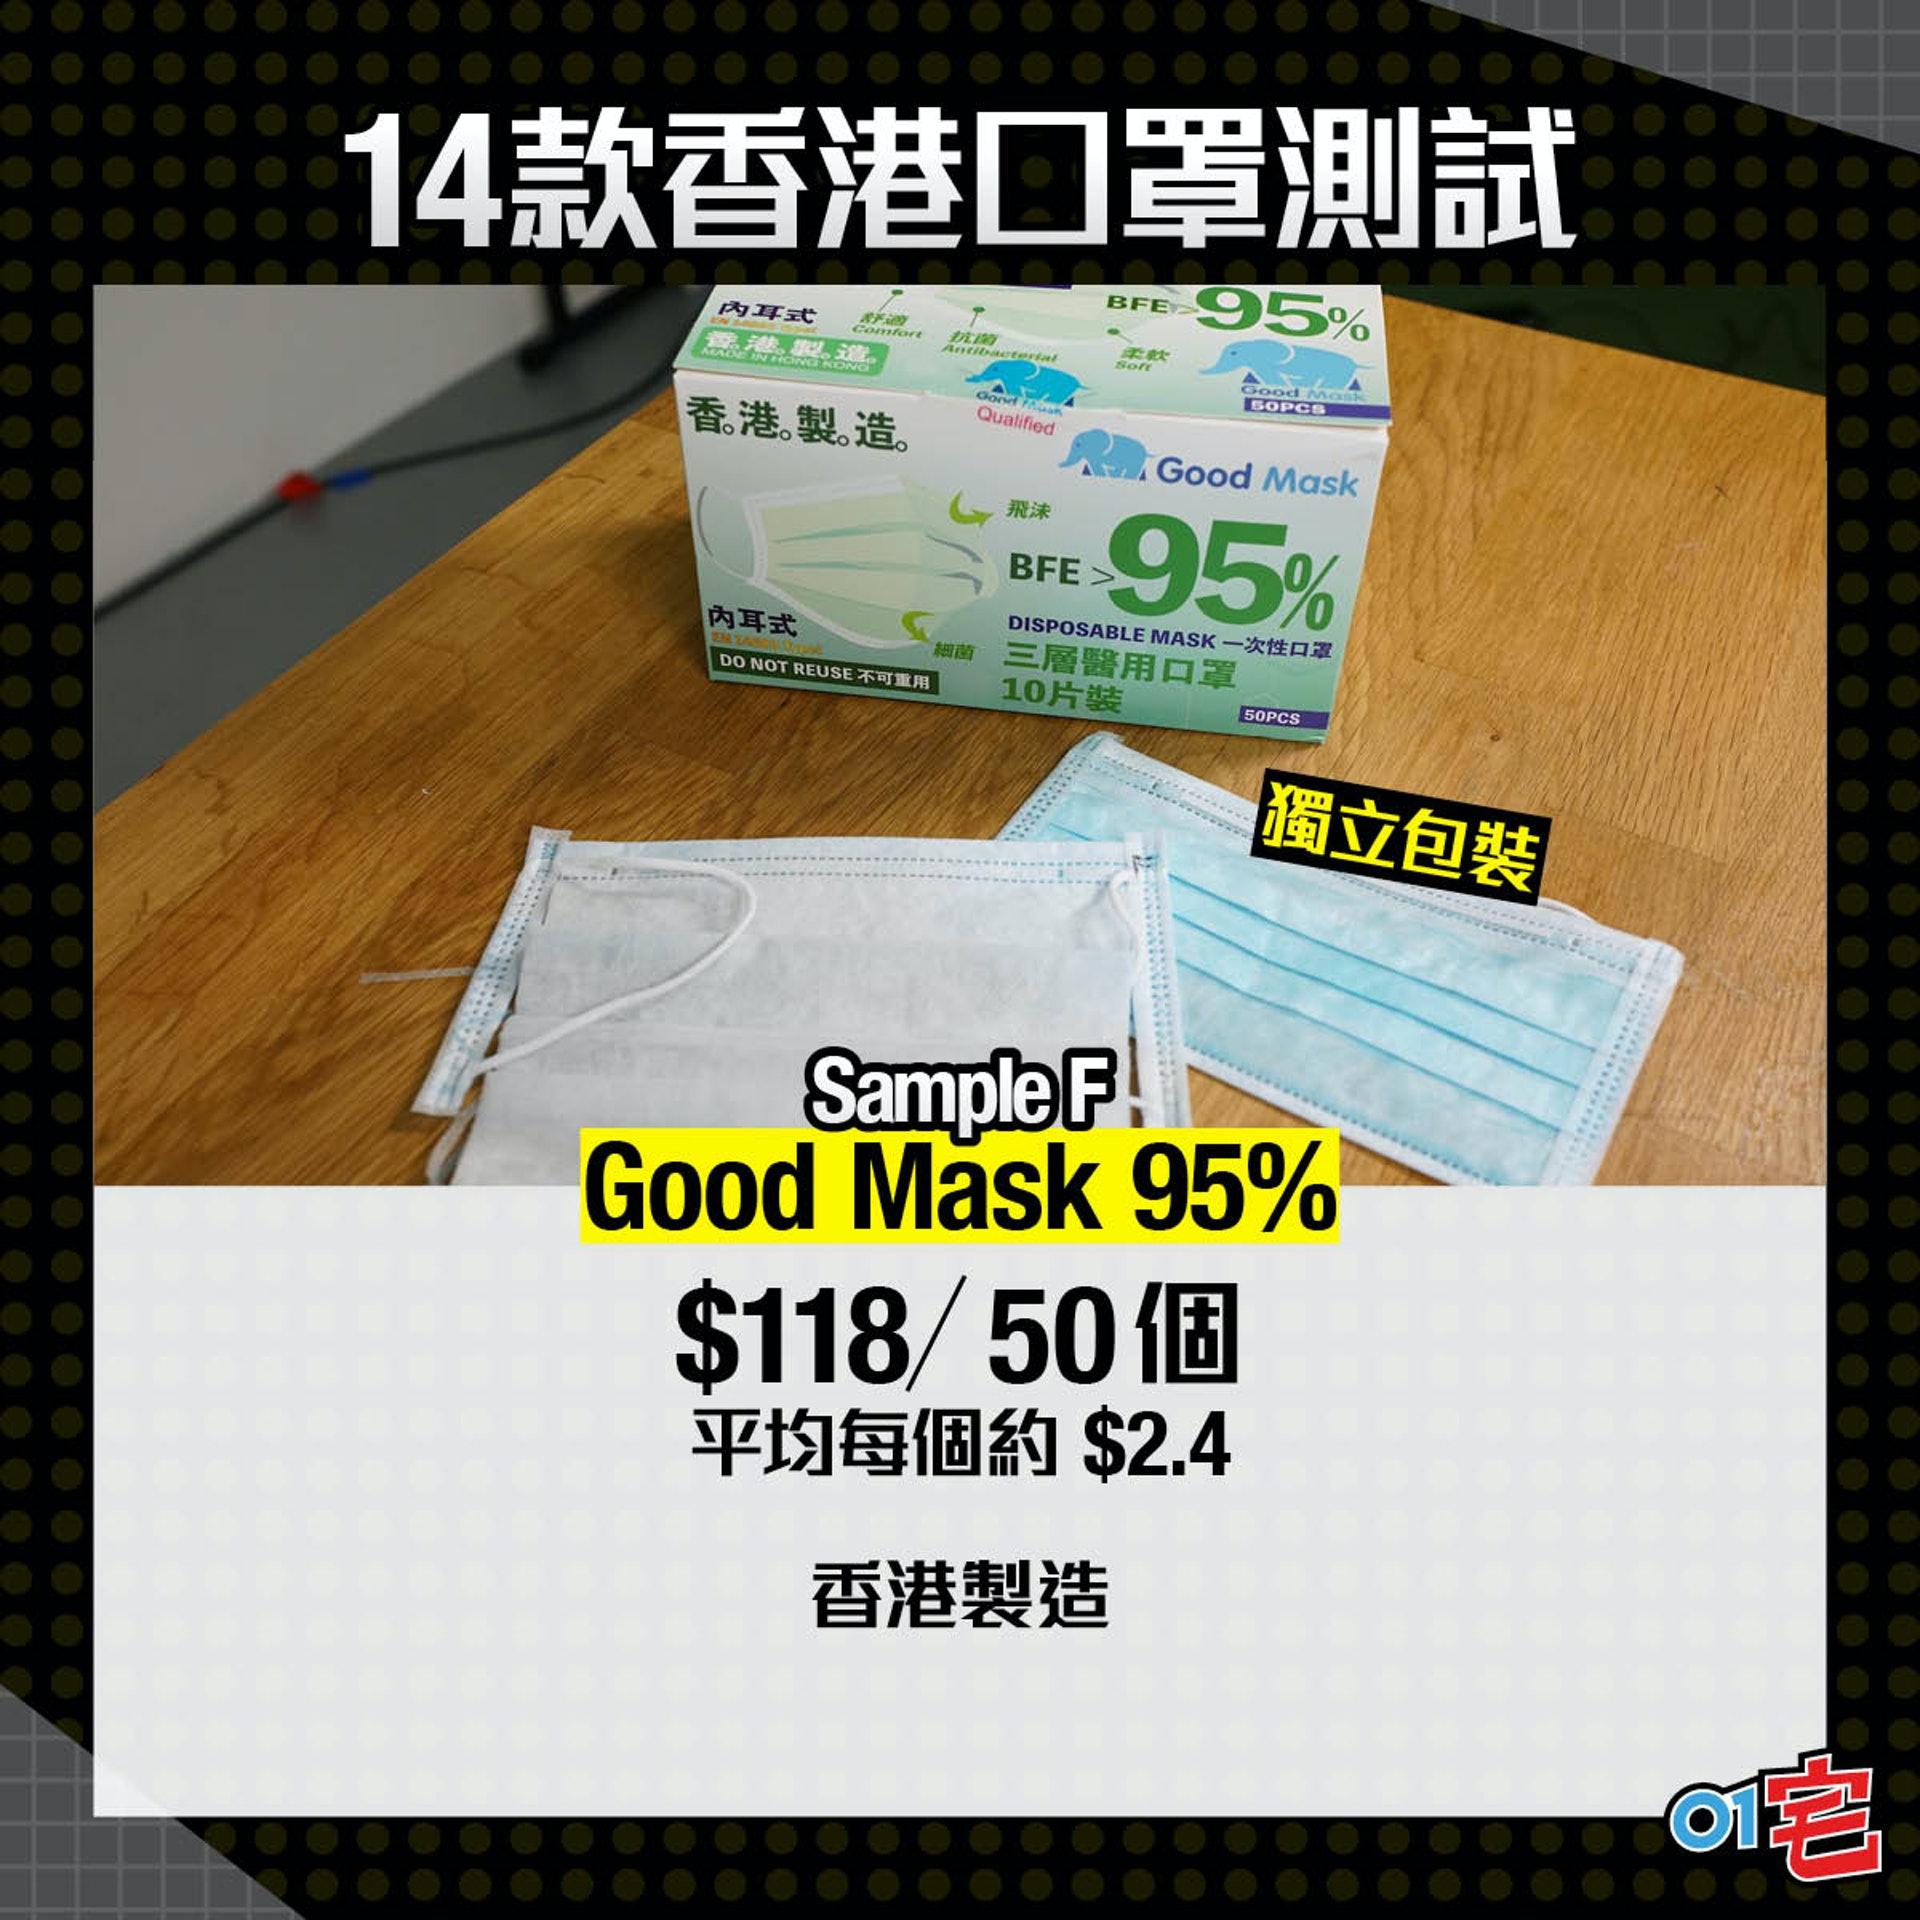 Good Mask 95%